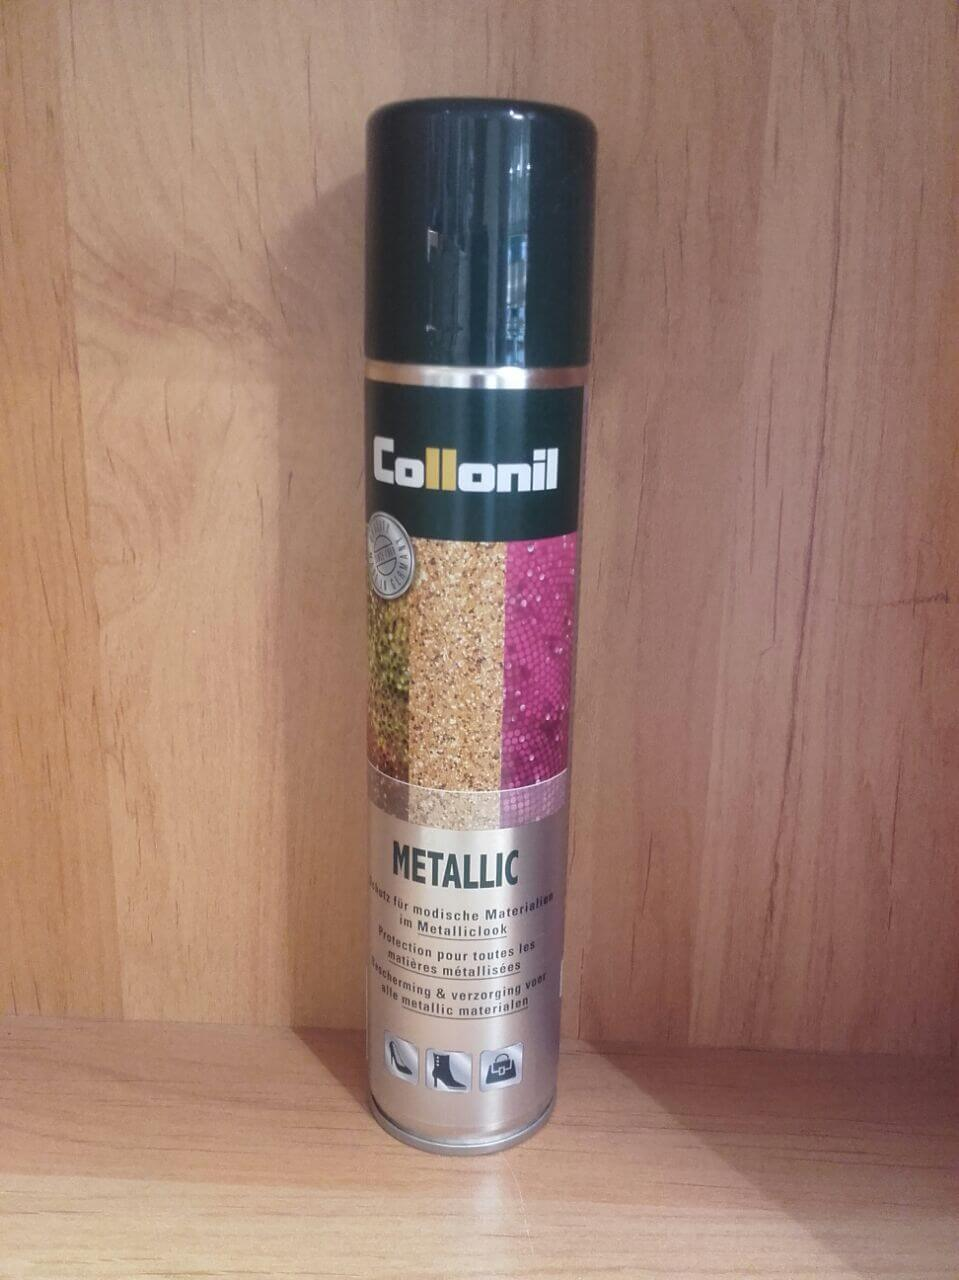 Metallicspray farblos Image